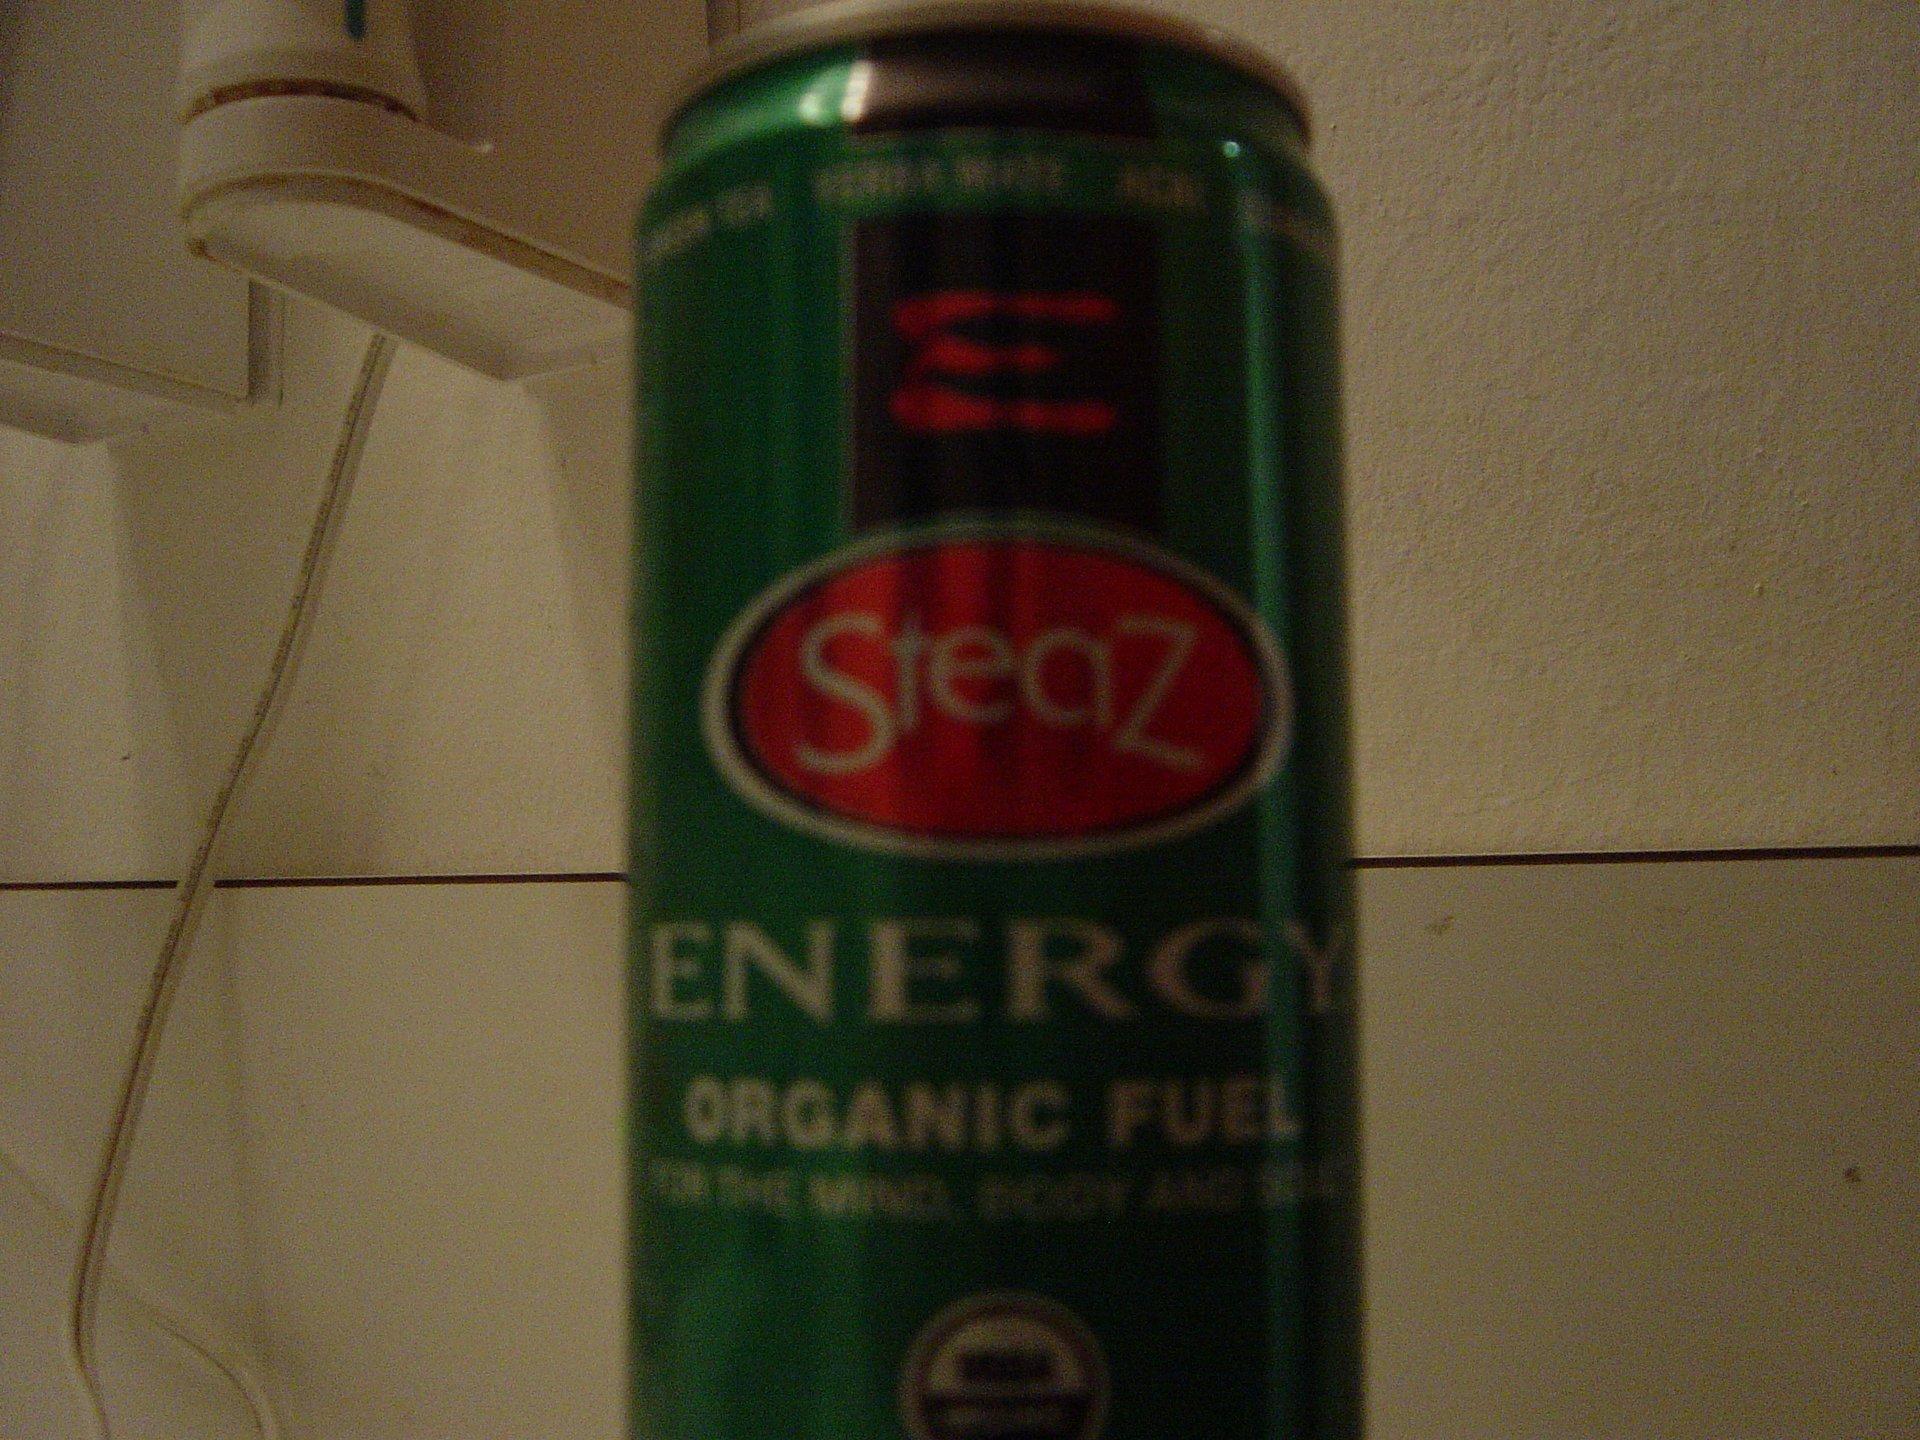 SteaZ energy drinks